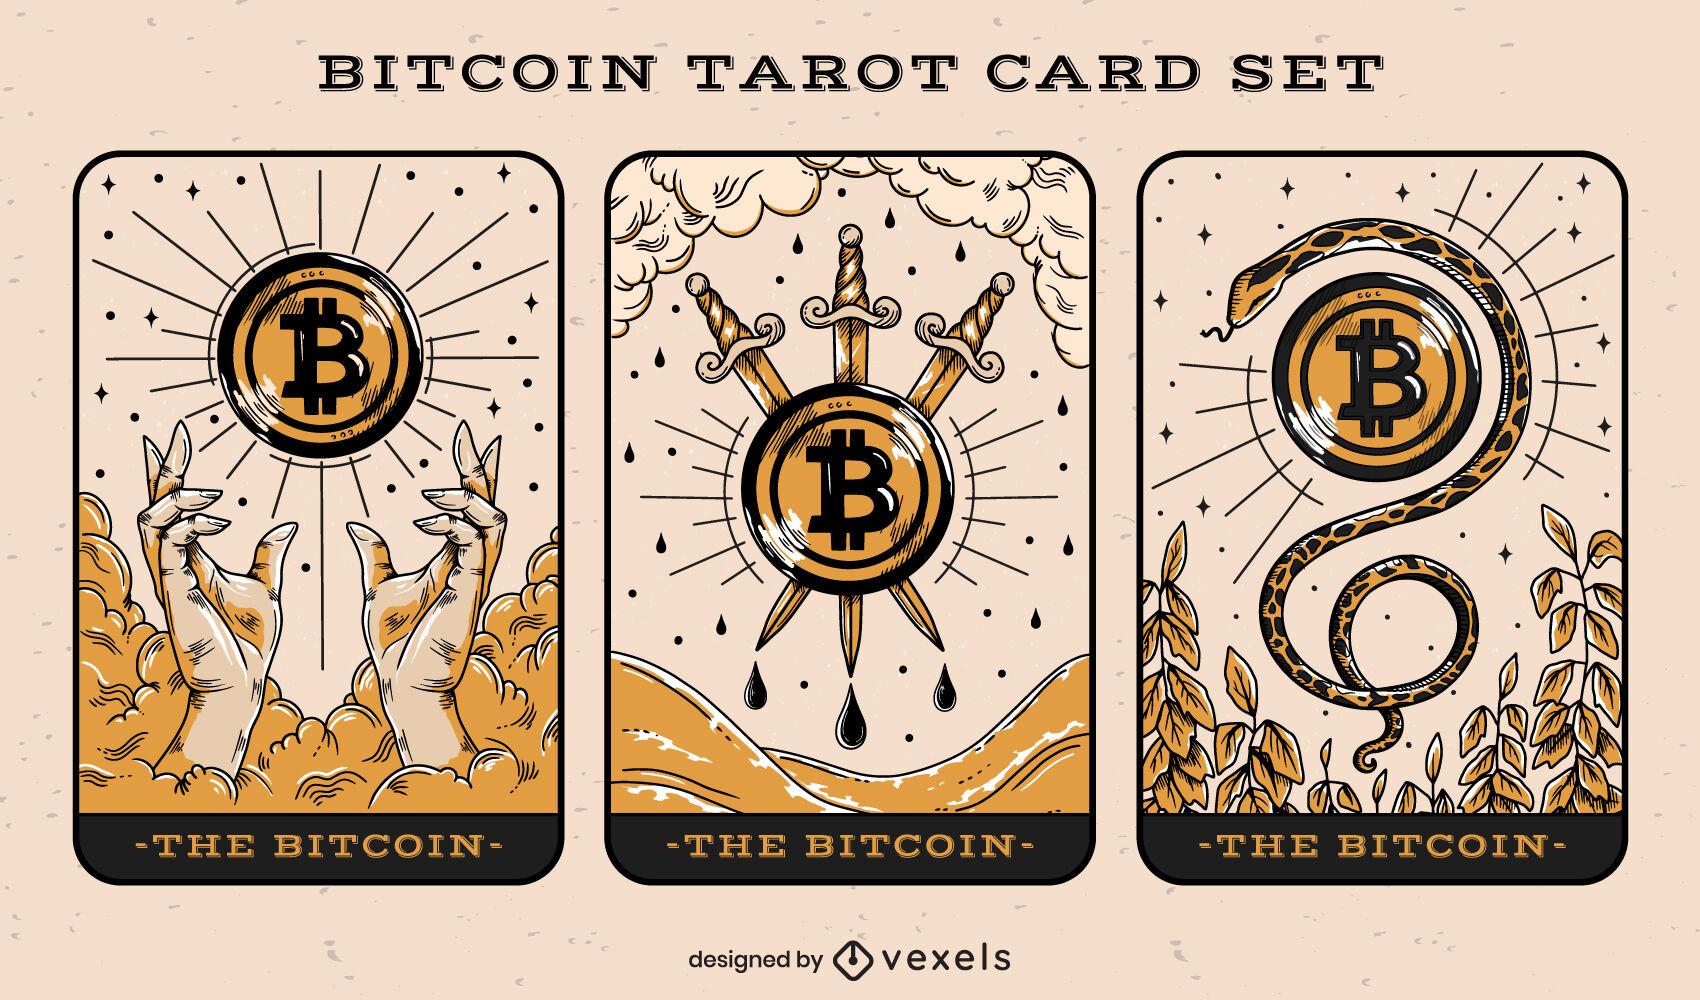 Conjunto de ilustraci?n de cartas de tarot de Bitcoin